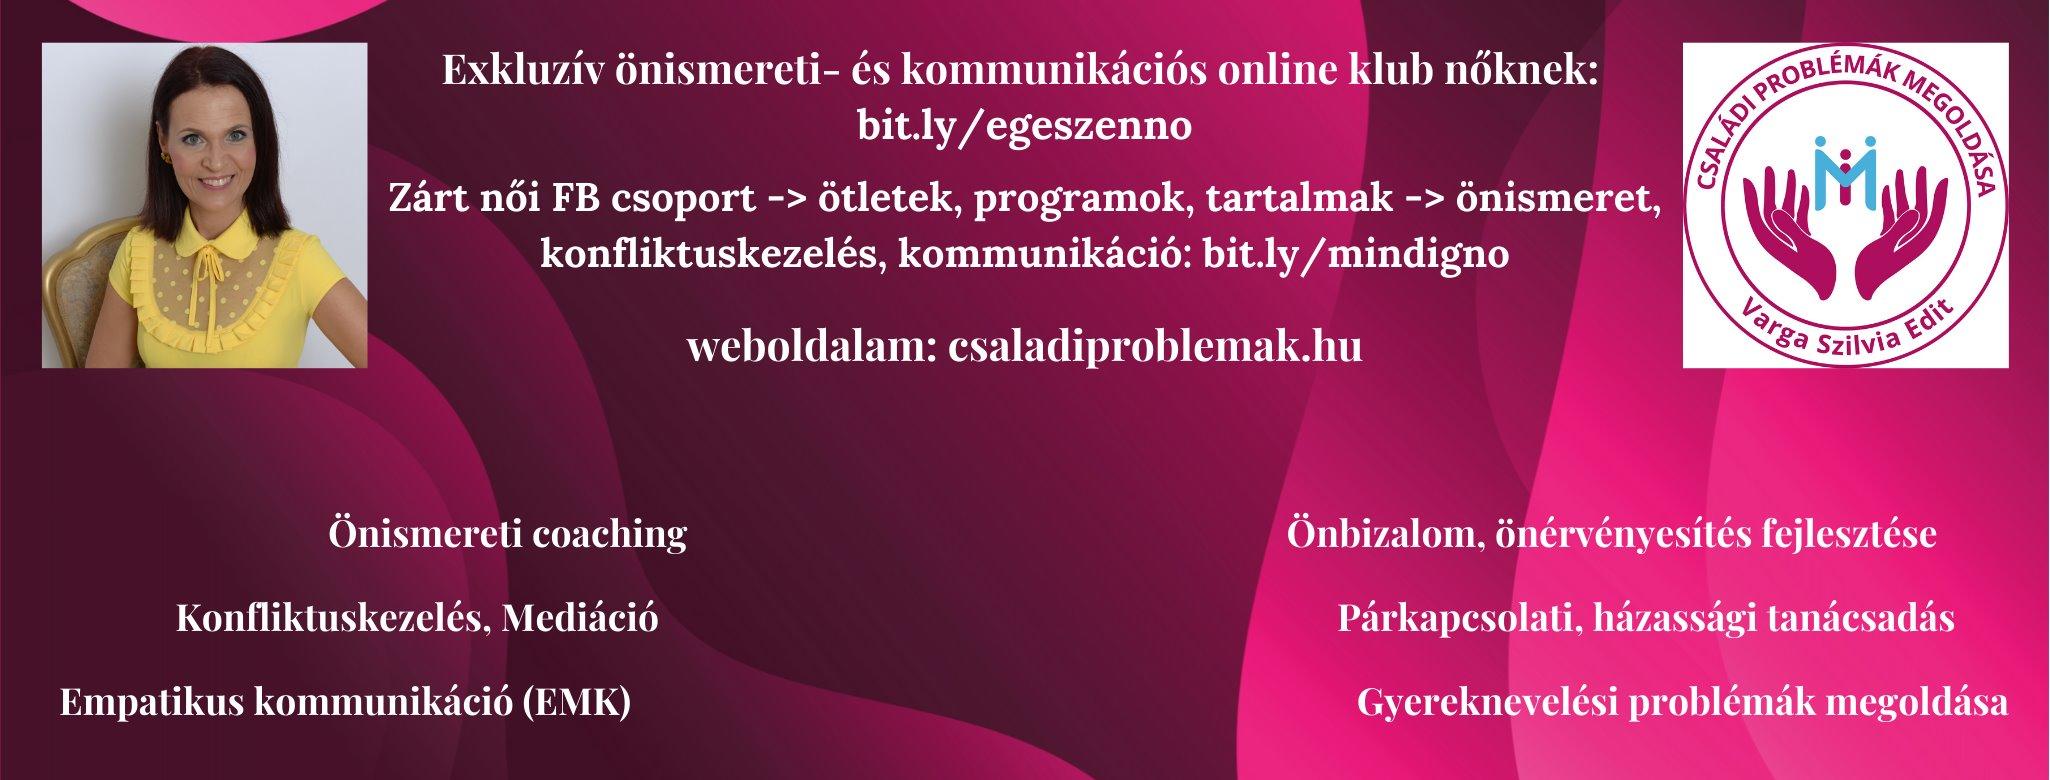 124383348_1745987918912529_1399458248263822649_o.jpg